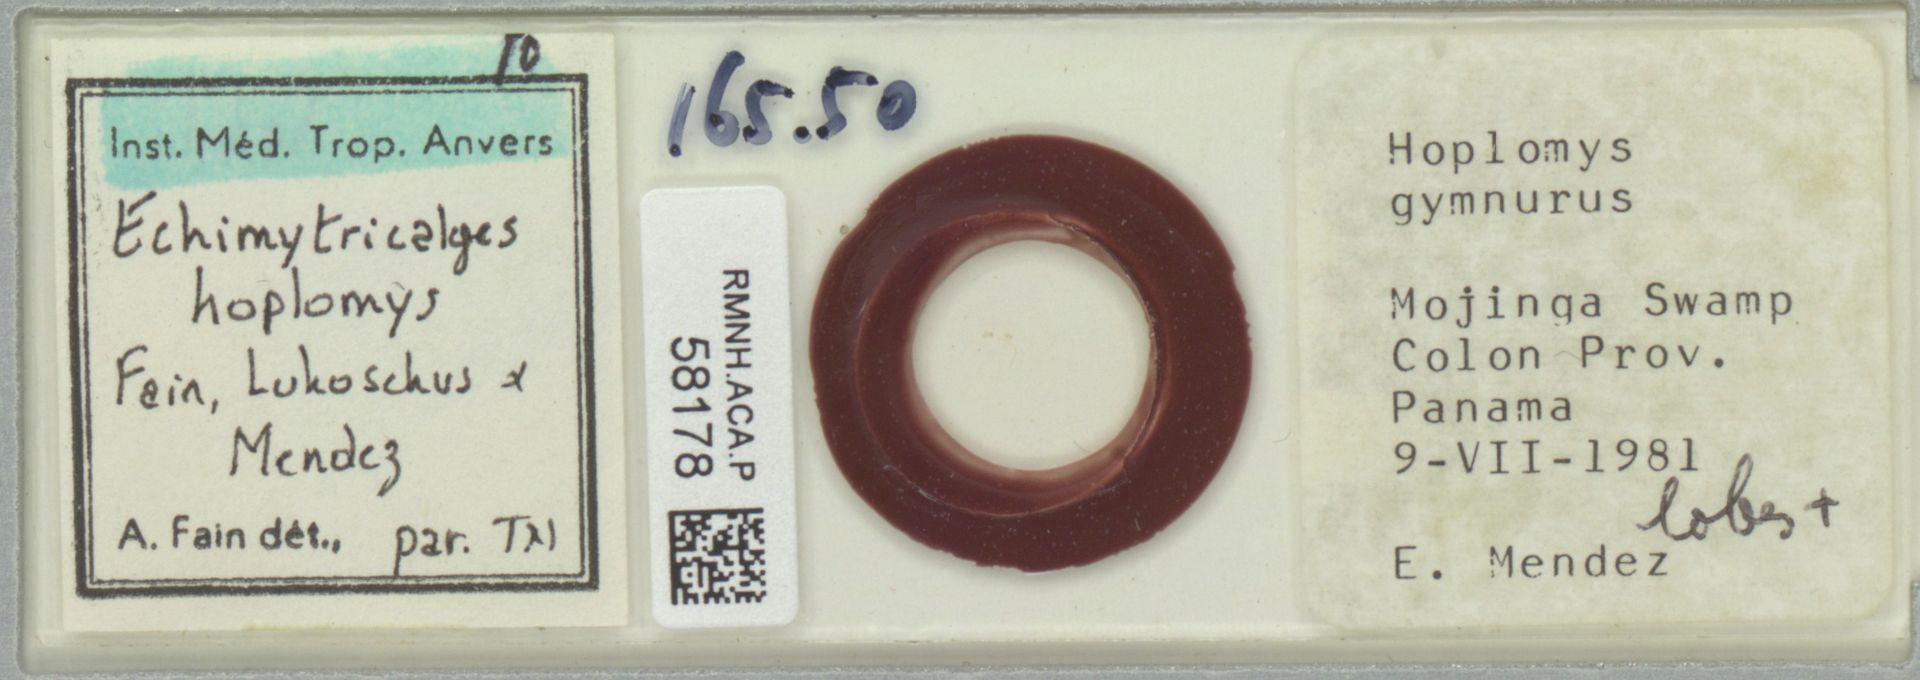 RMNH.ACA.P.58178 | Echimytricalges hoplomys Fain, Lukoschus & Mendez